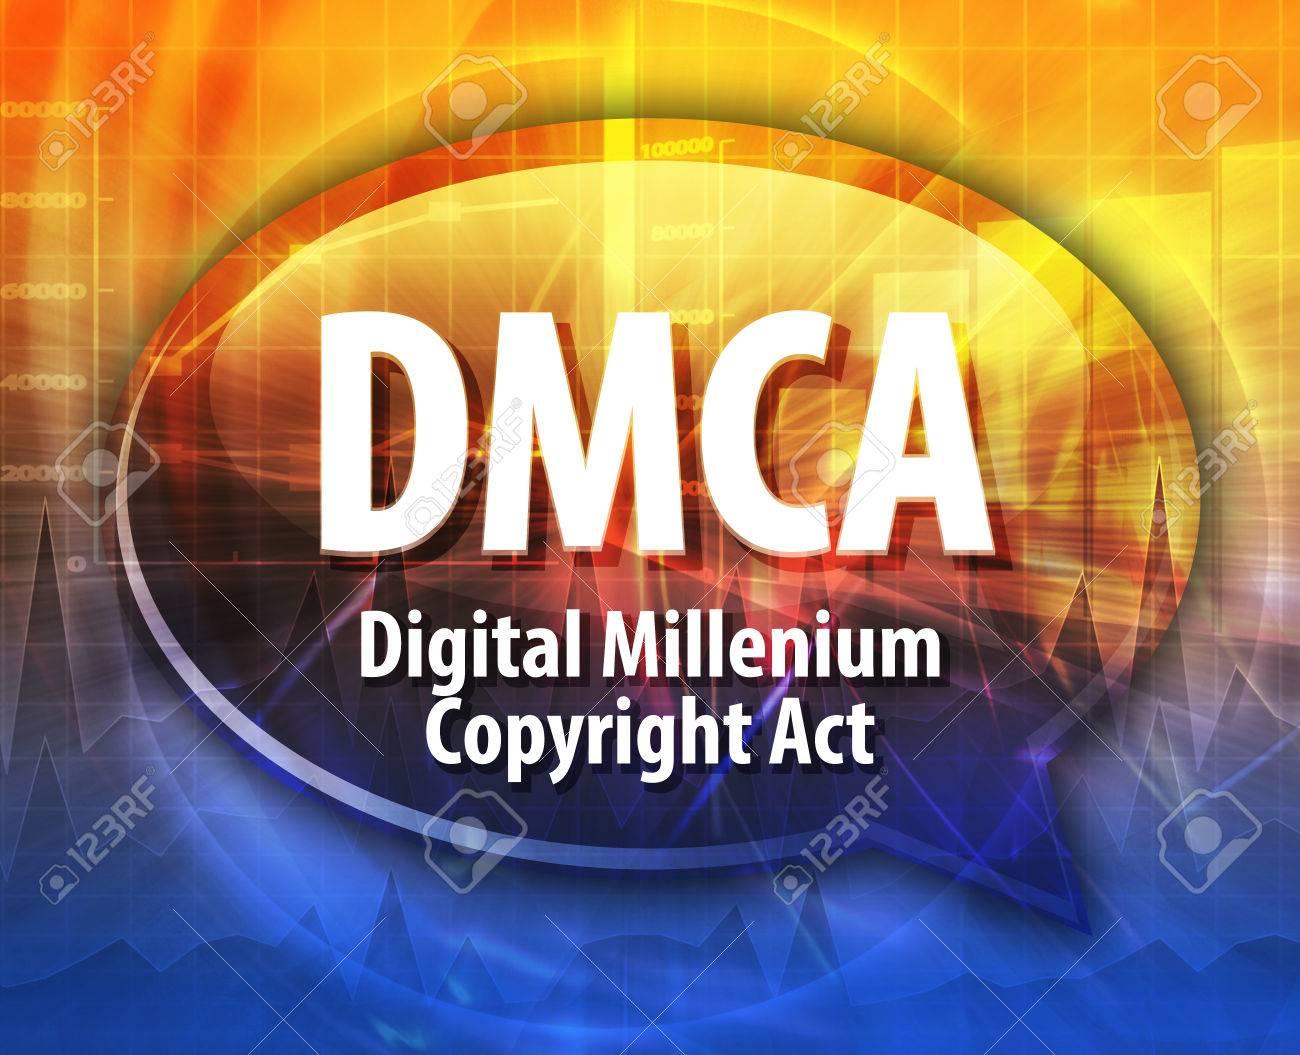 Speech bubble illustration of information technology acronym abbreviation term definition DMCA Digital Millennium Copyright Act - 43519211